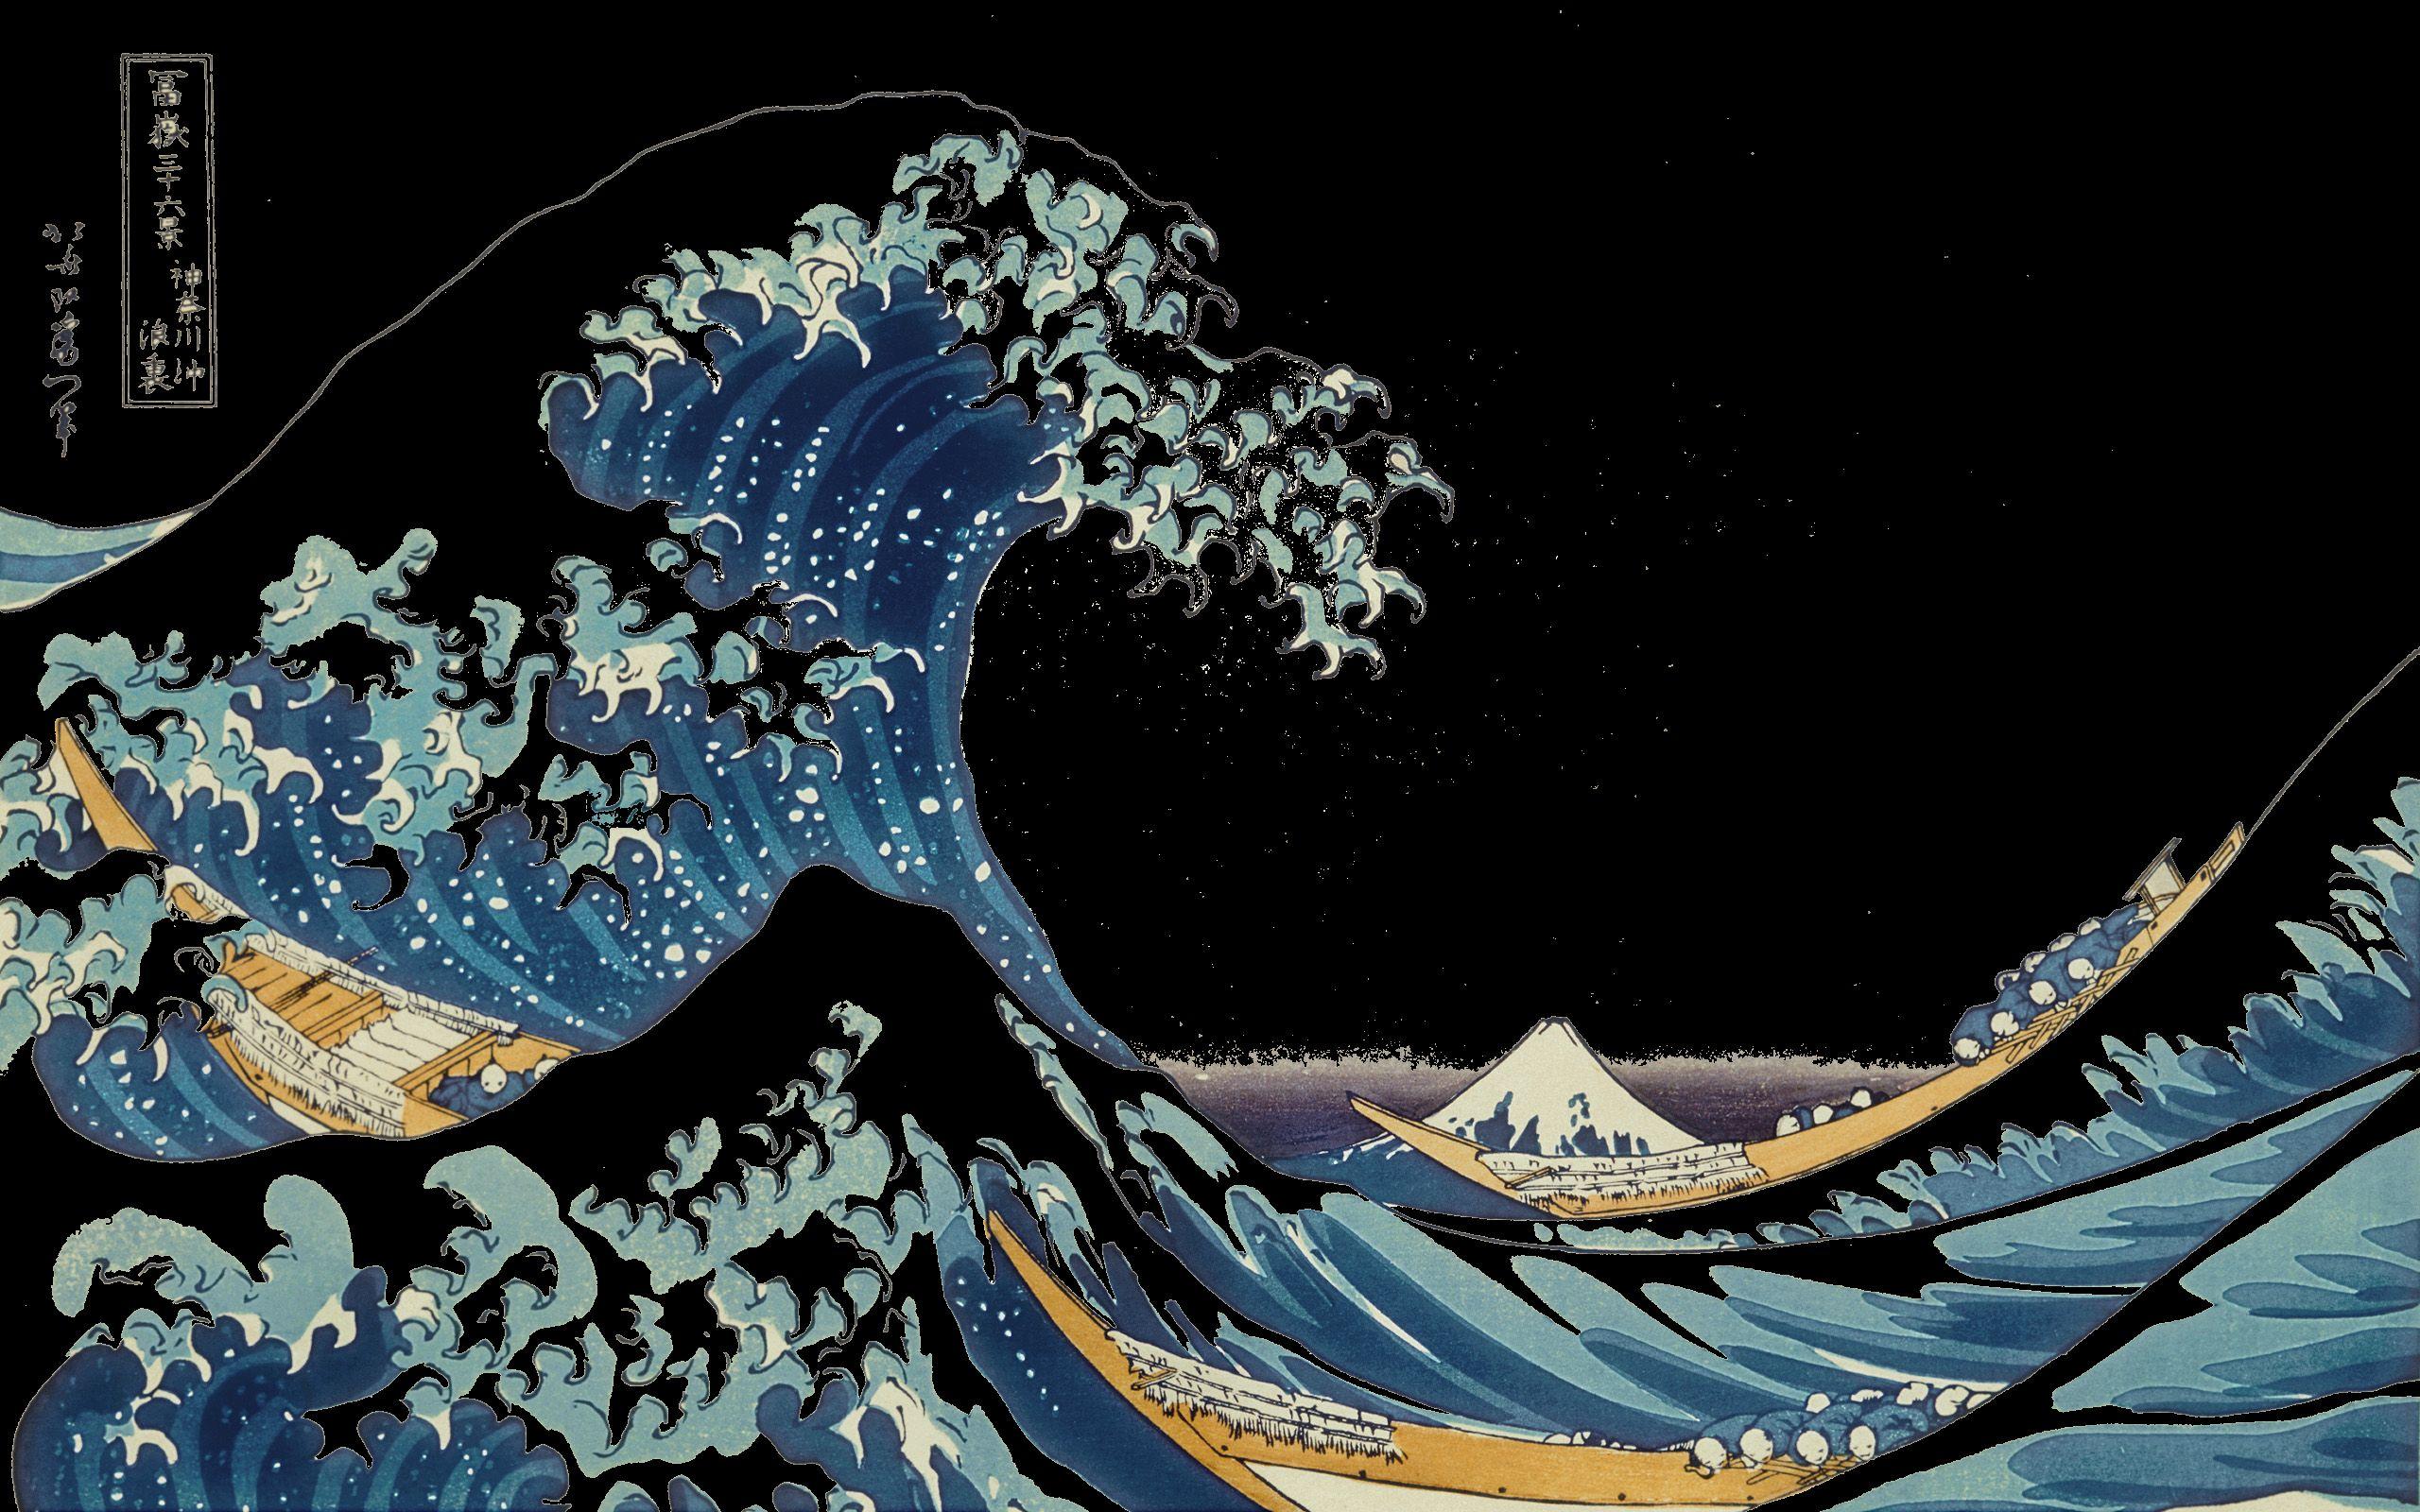 Artwork Inverted The Great Wave Off Kanagawa Hd Wallpaper View